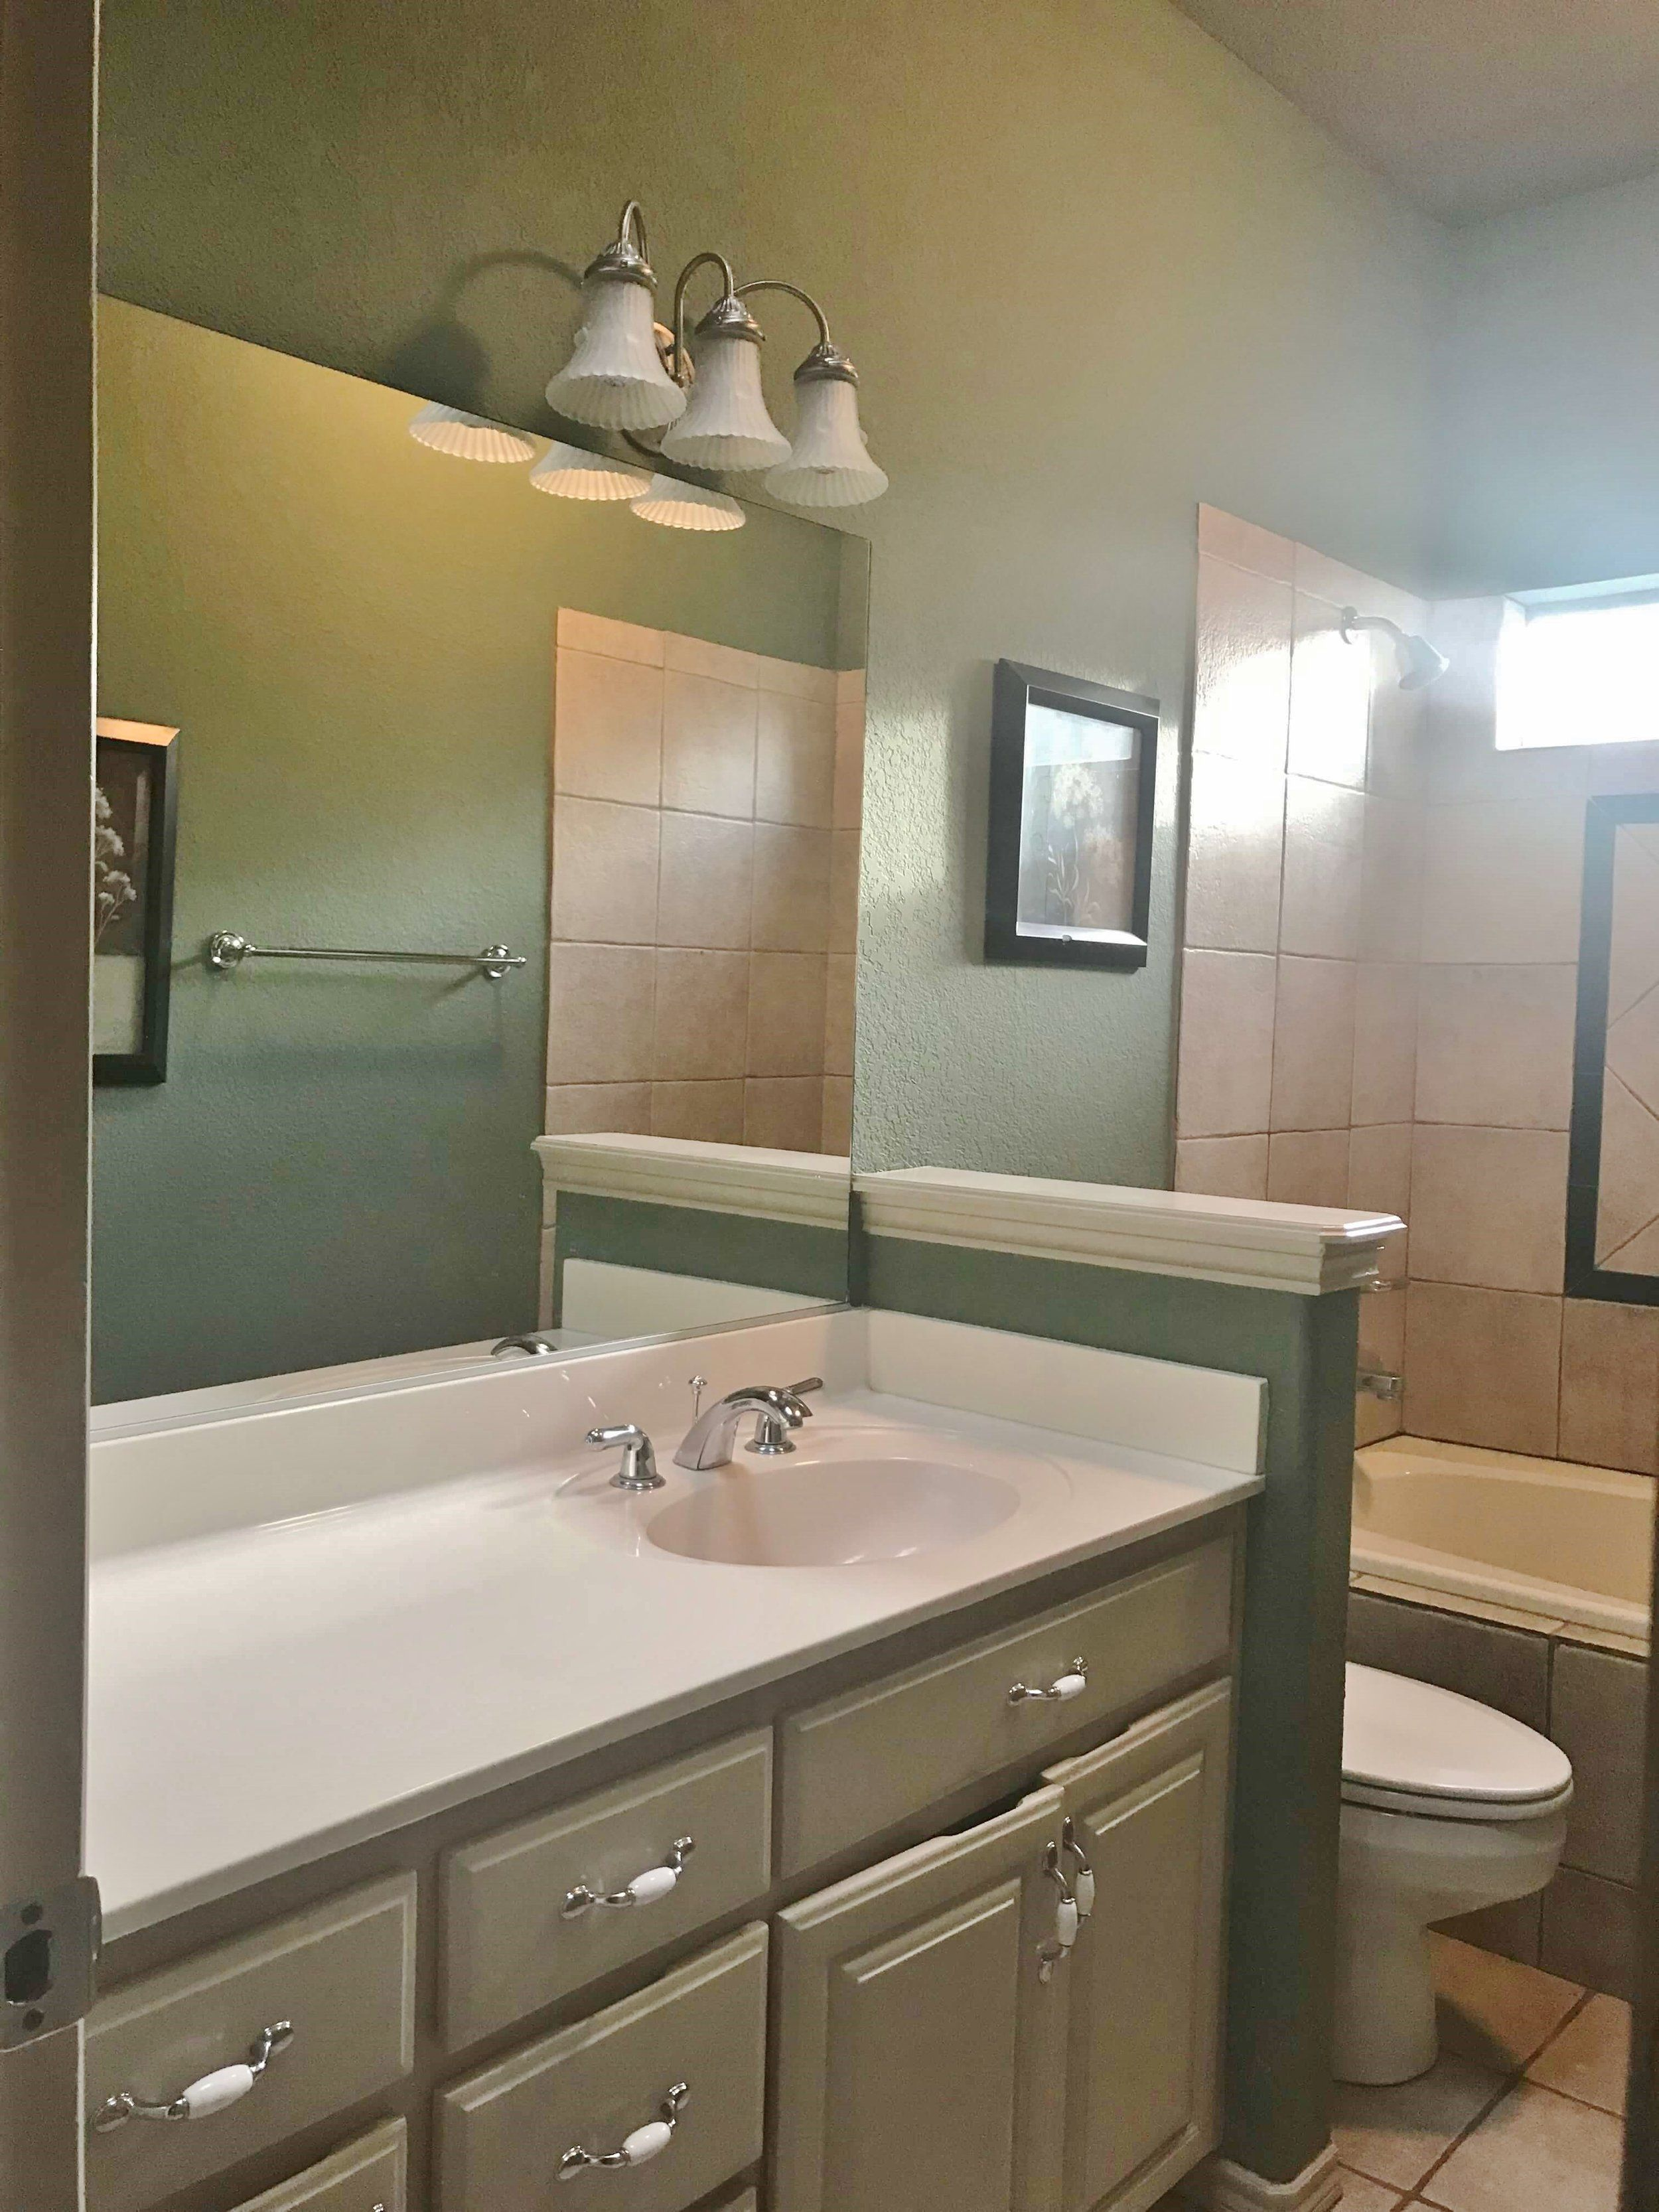 Design Plan For A 5 X 10 Standard Bathroom Remodel How To Plan Design Bathroom